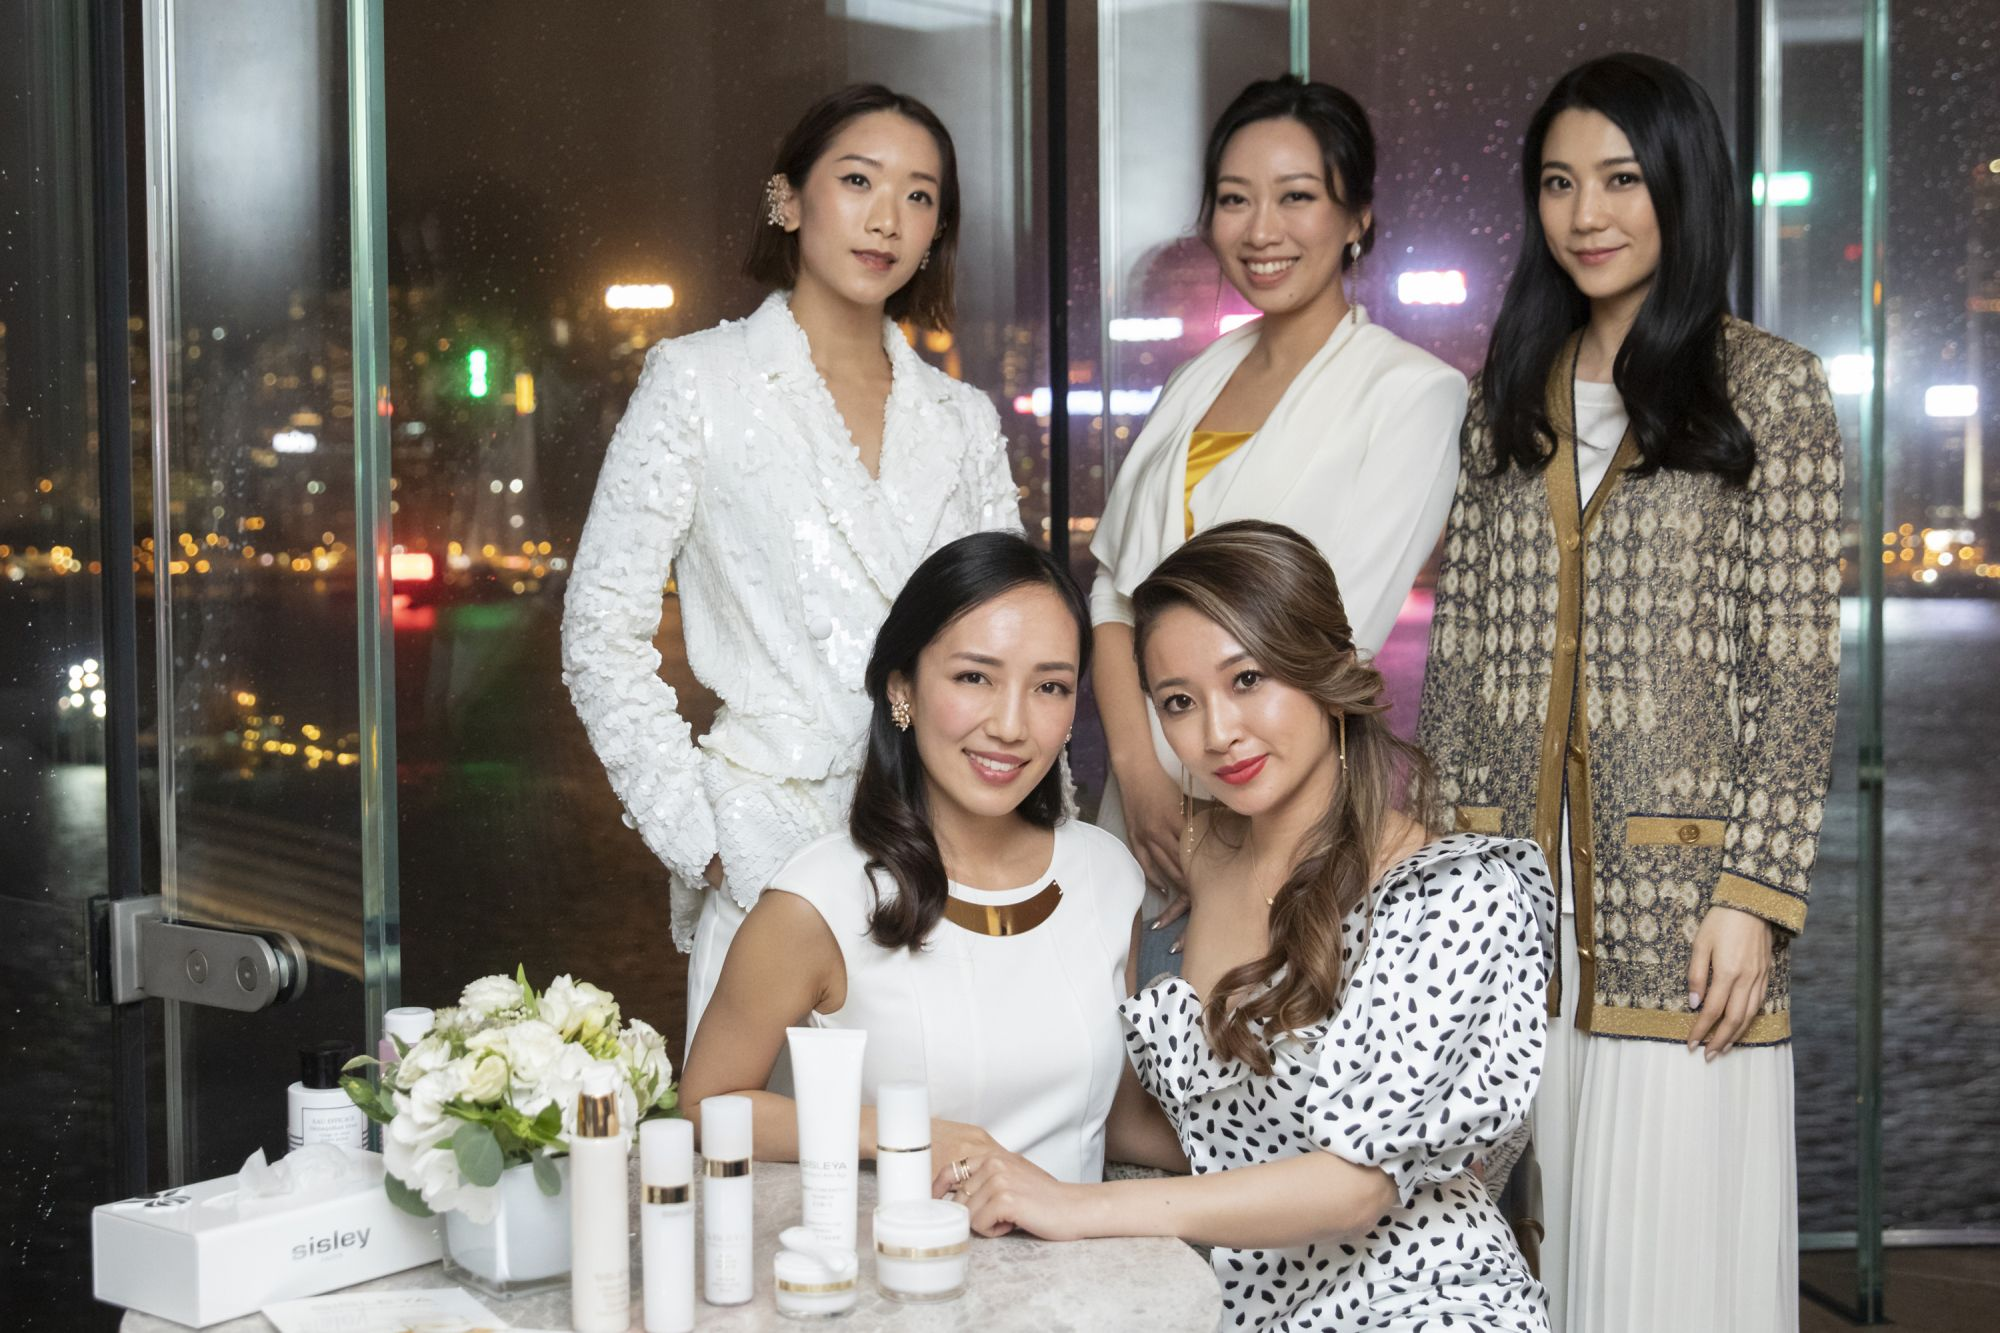 Veronica Li, Veronica Lam, Vincy Yeung, Christine Fok, Sarah Zhuang